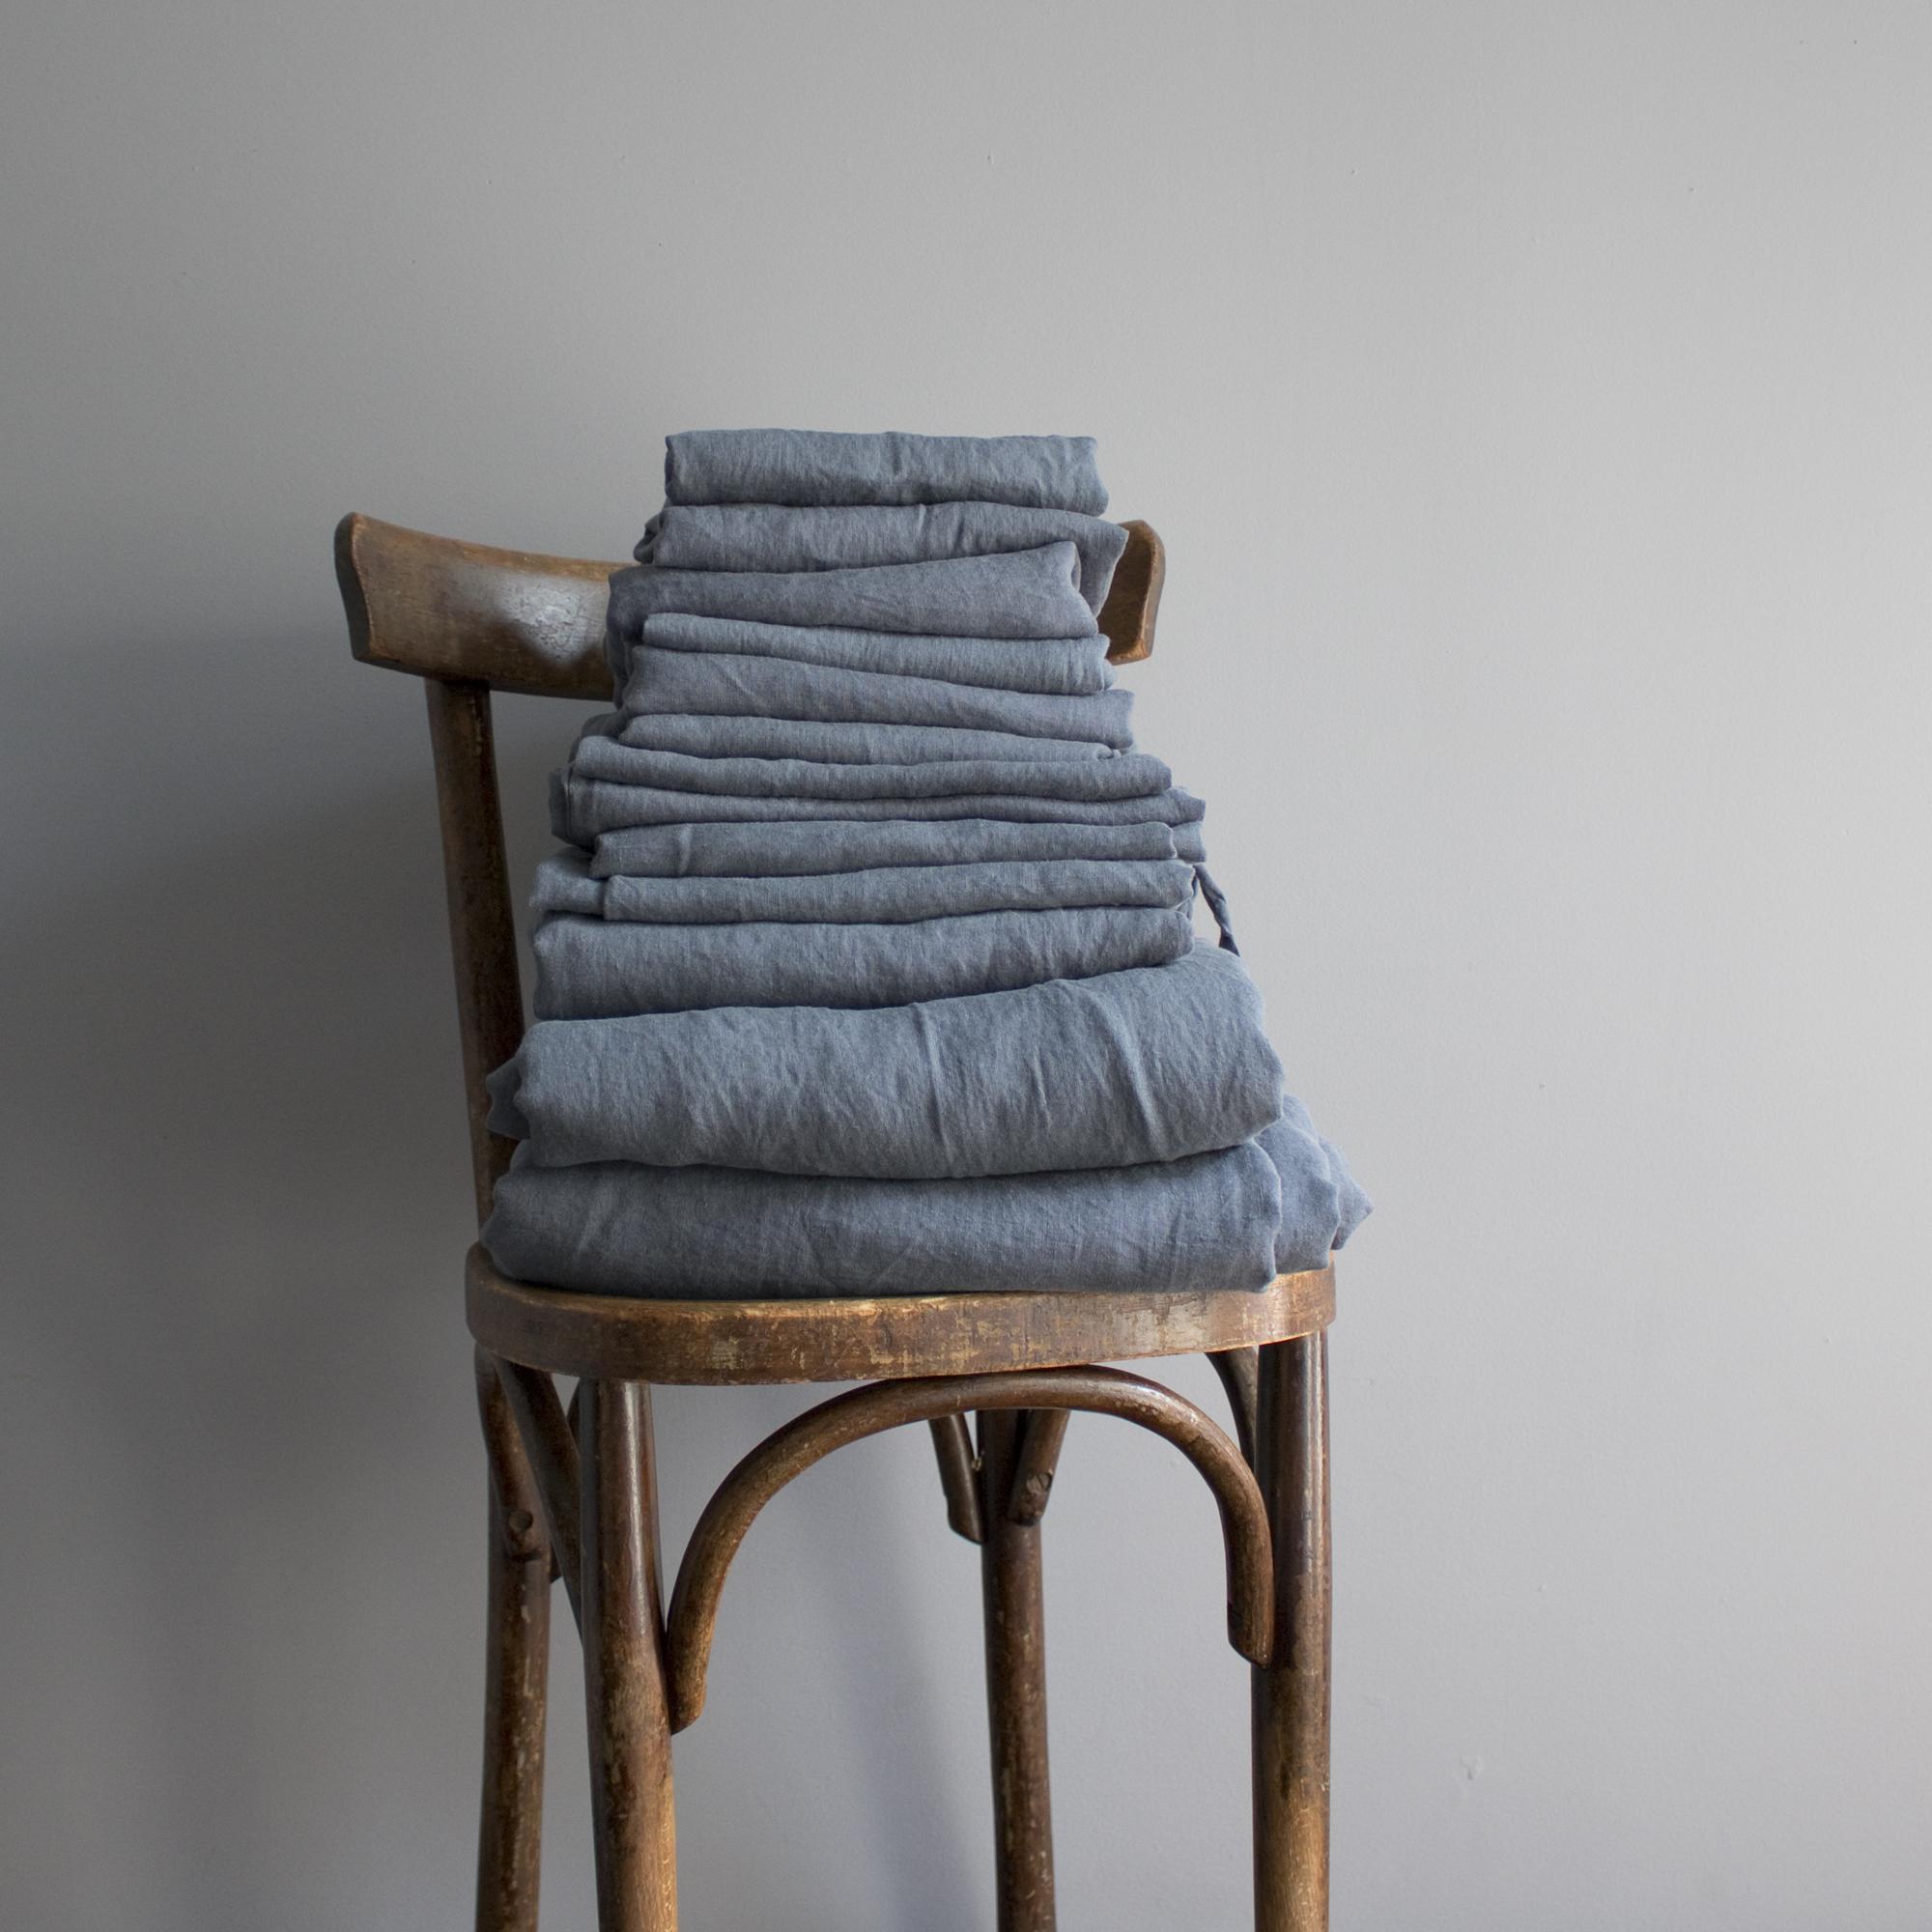 LUSITANO1143_Amalia_LochBlueGray_Chair_2000x2000.jpg